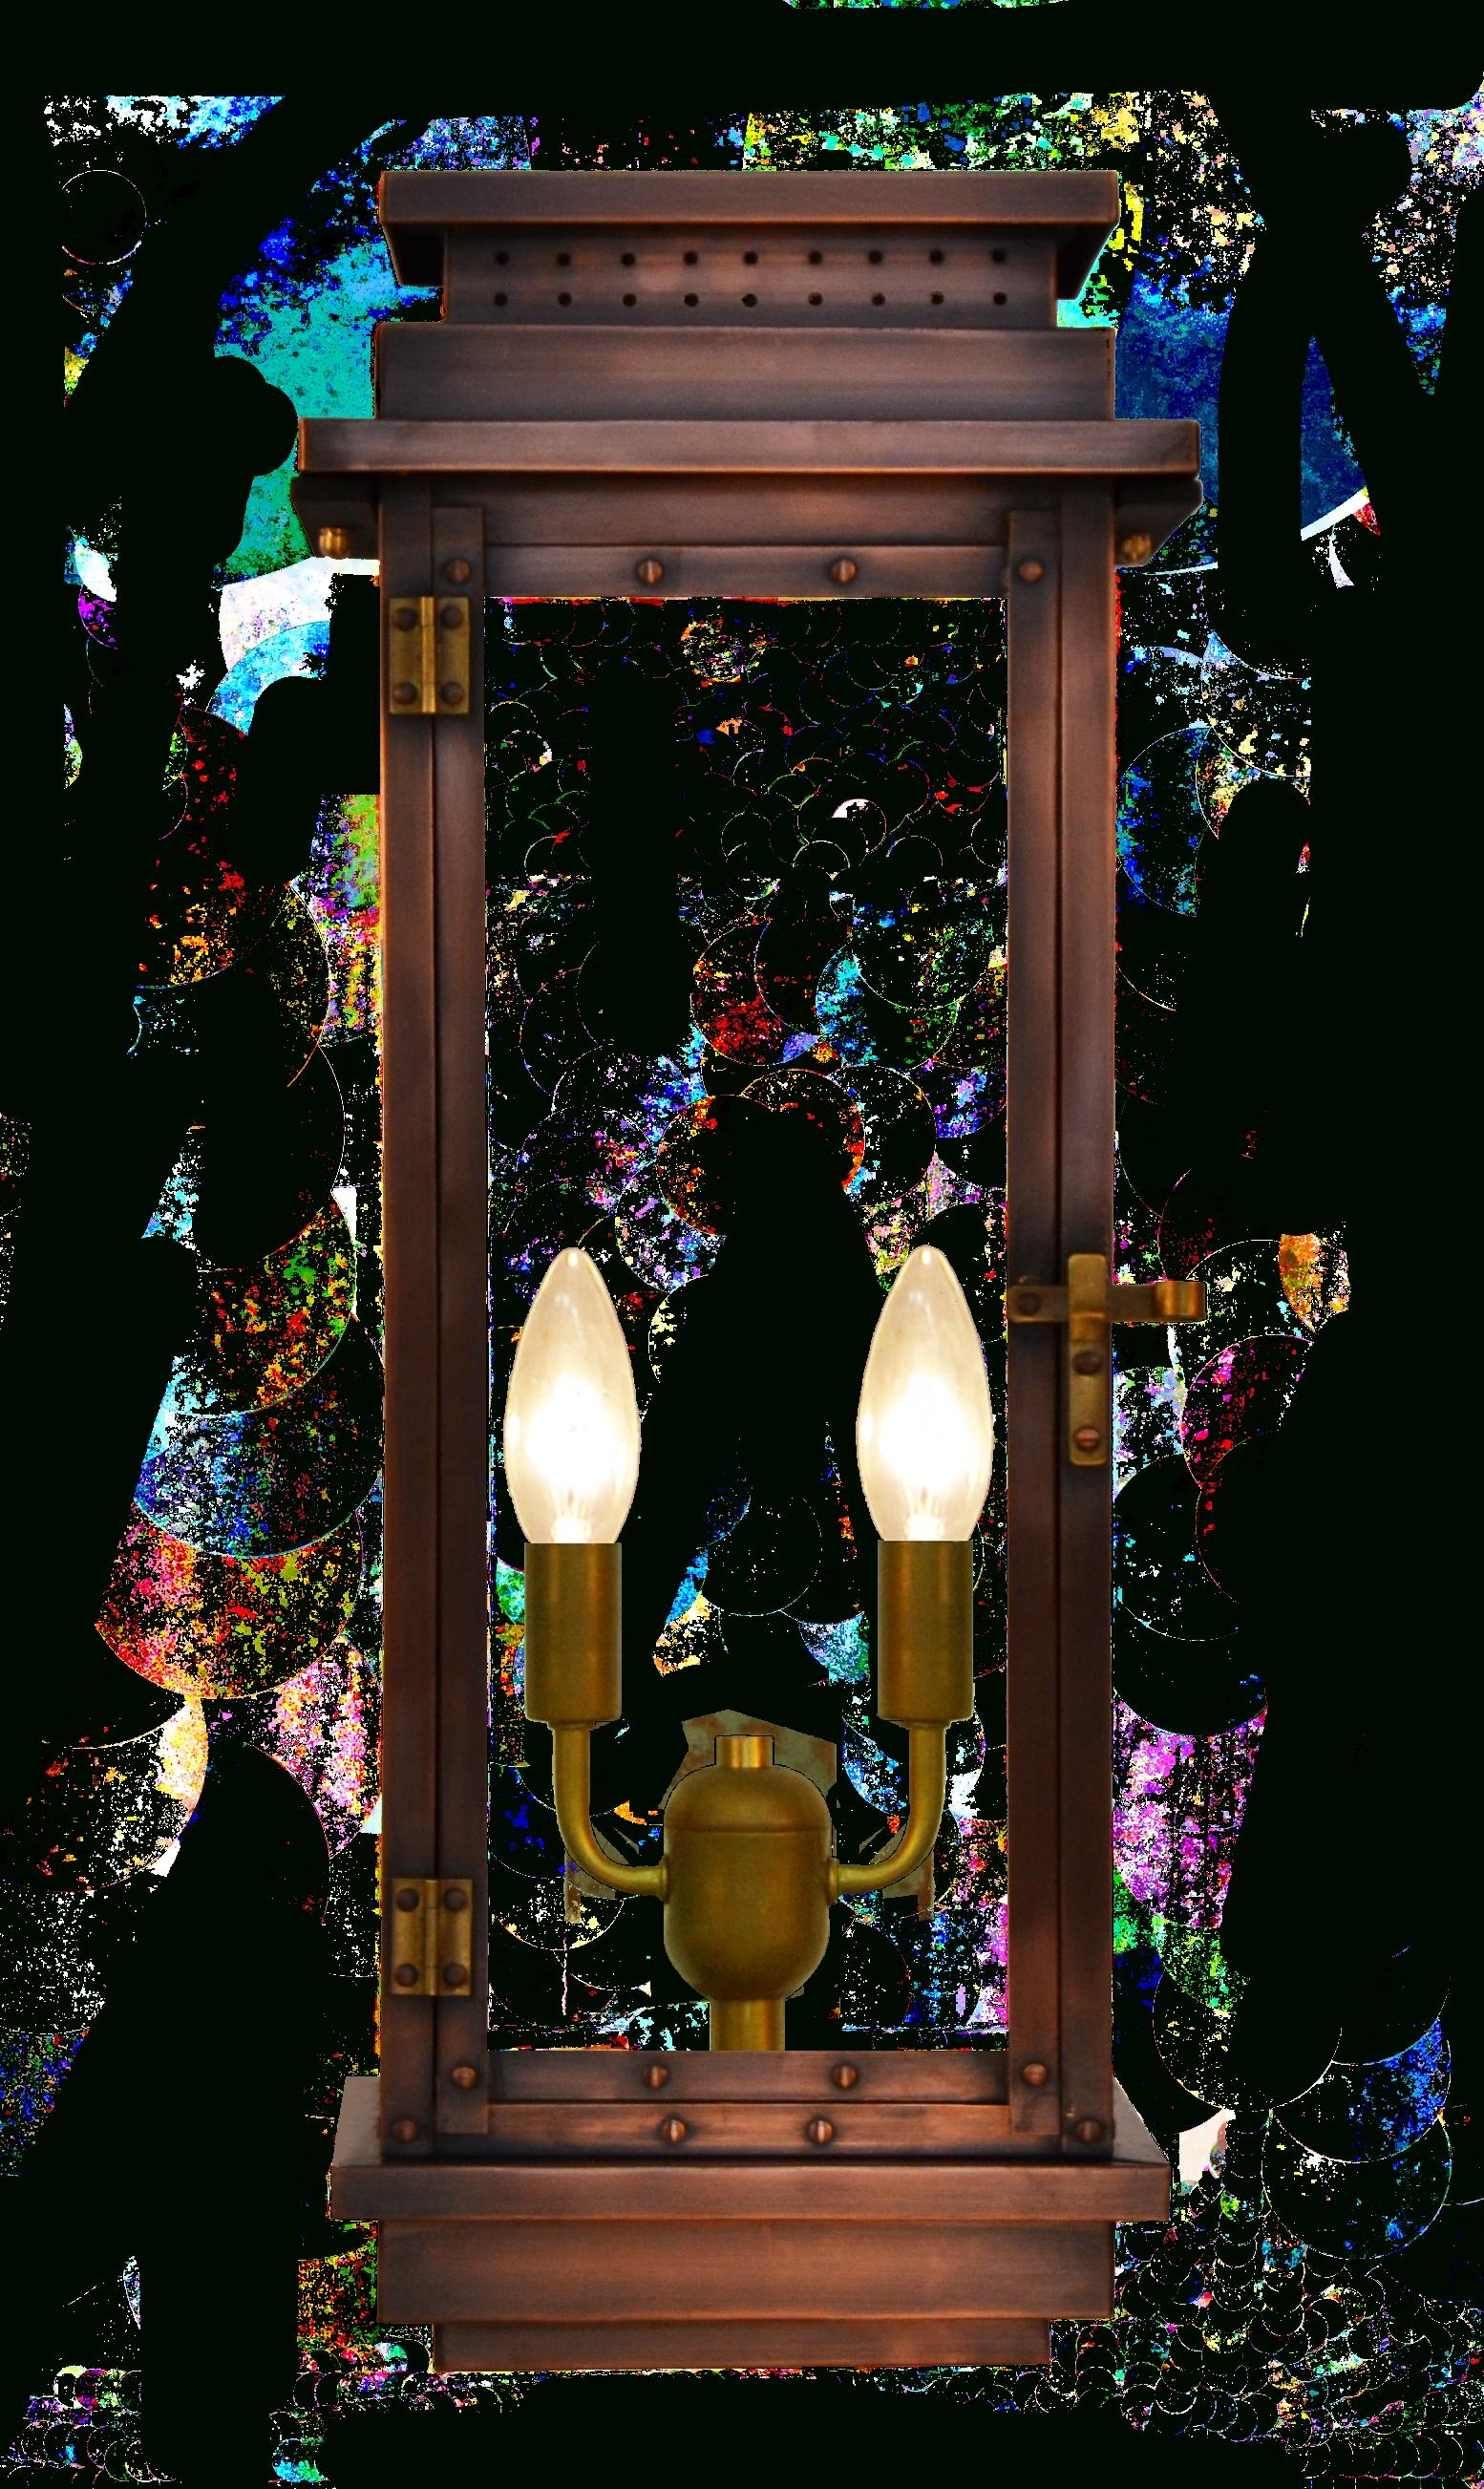 Contempo Gas Or Electric Copper Lantern – Outdoor Lighting & Lamps In Copper Outdoor Electric Lanterns (View 5 of 20)